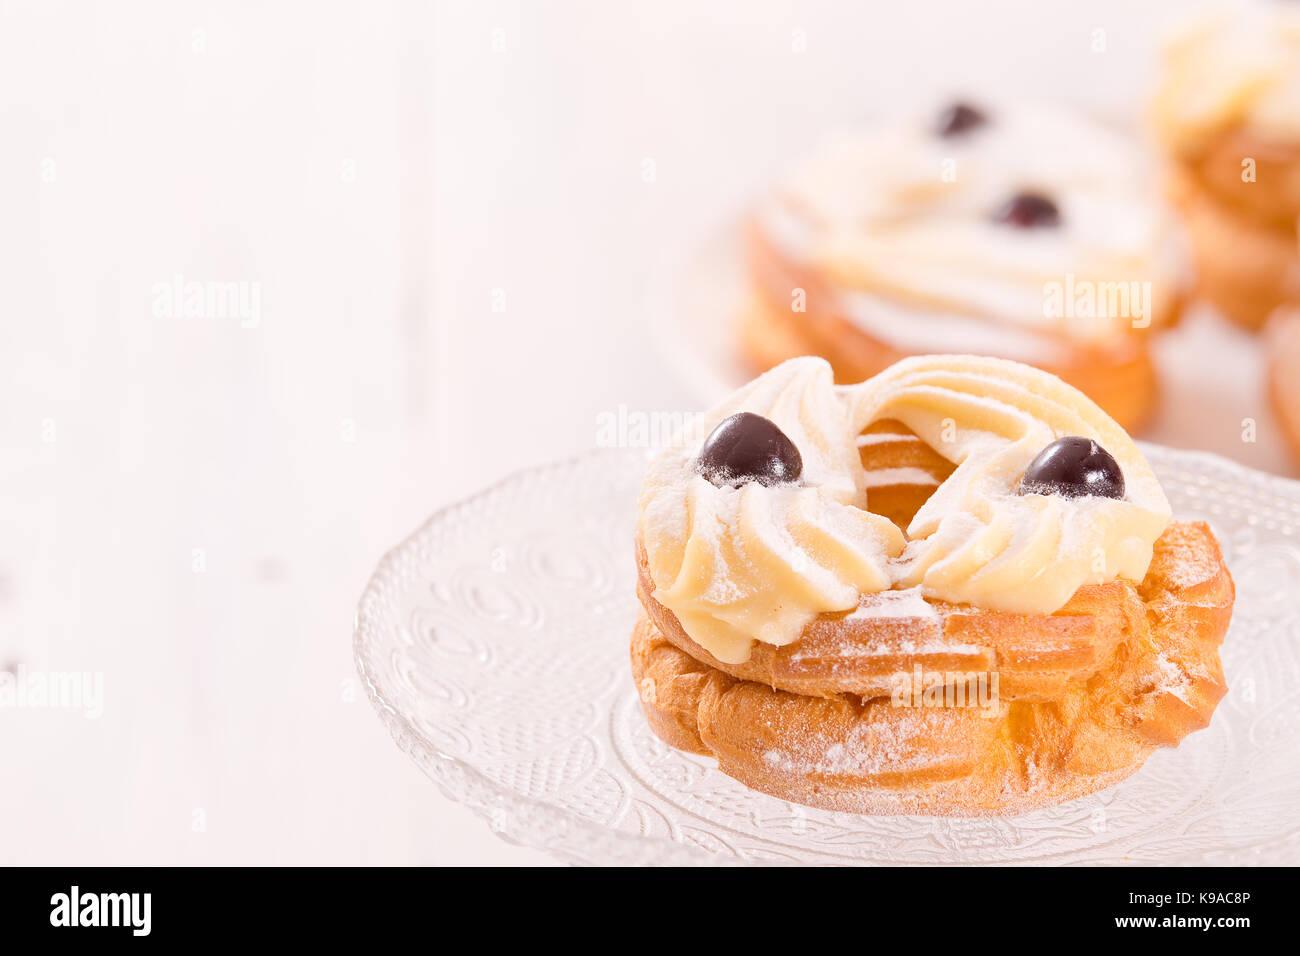 Las rosquillas con crema pastelera. Imagen De Stock